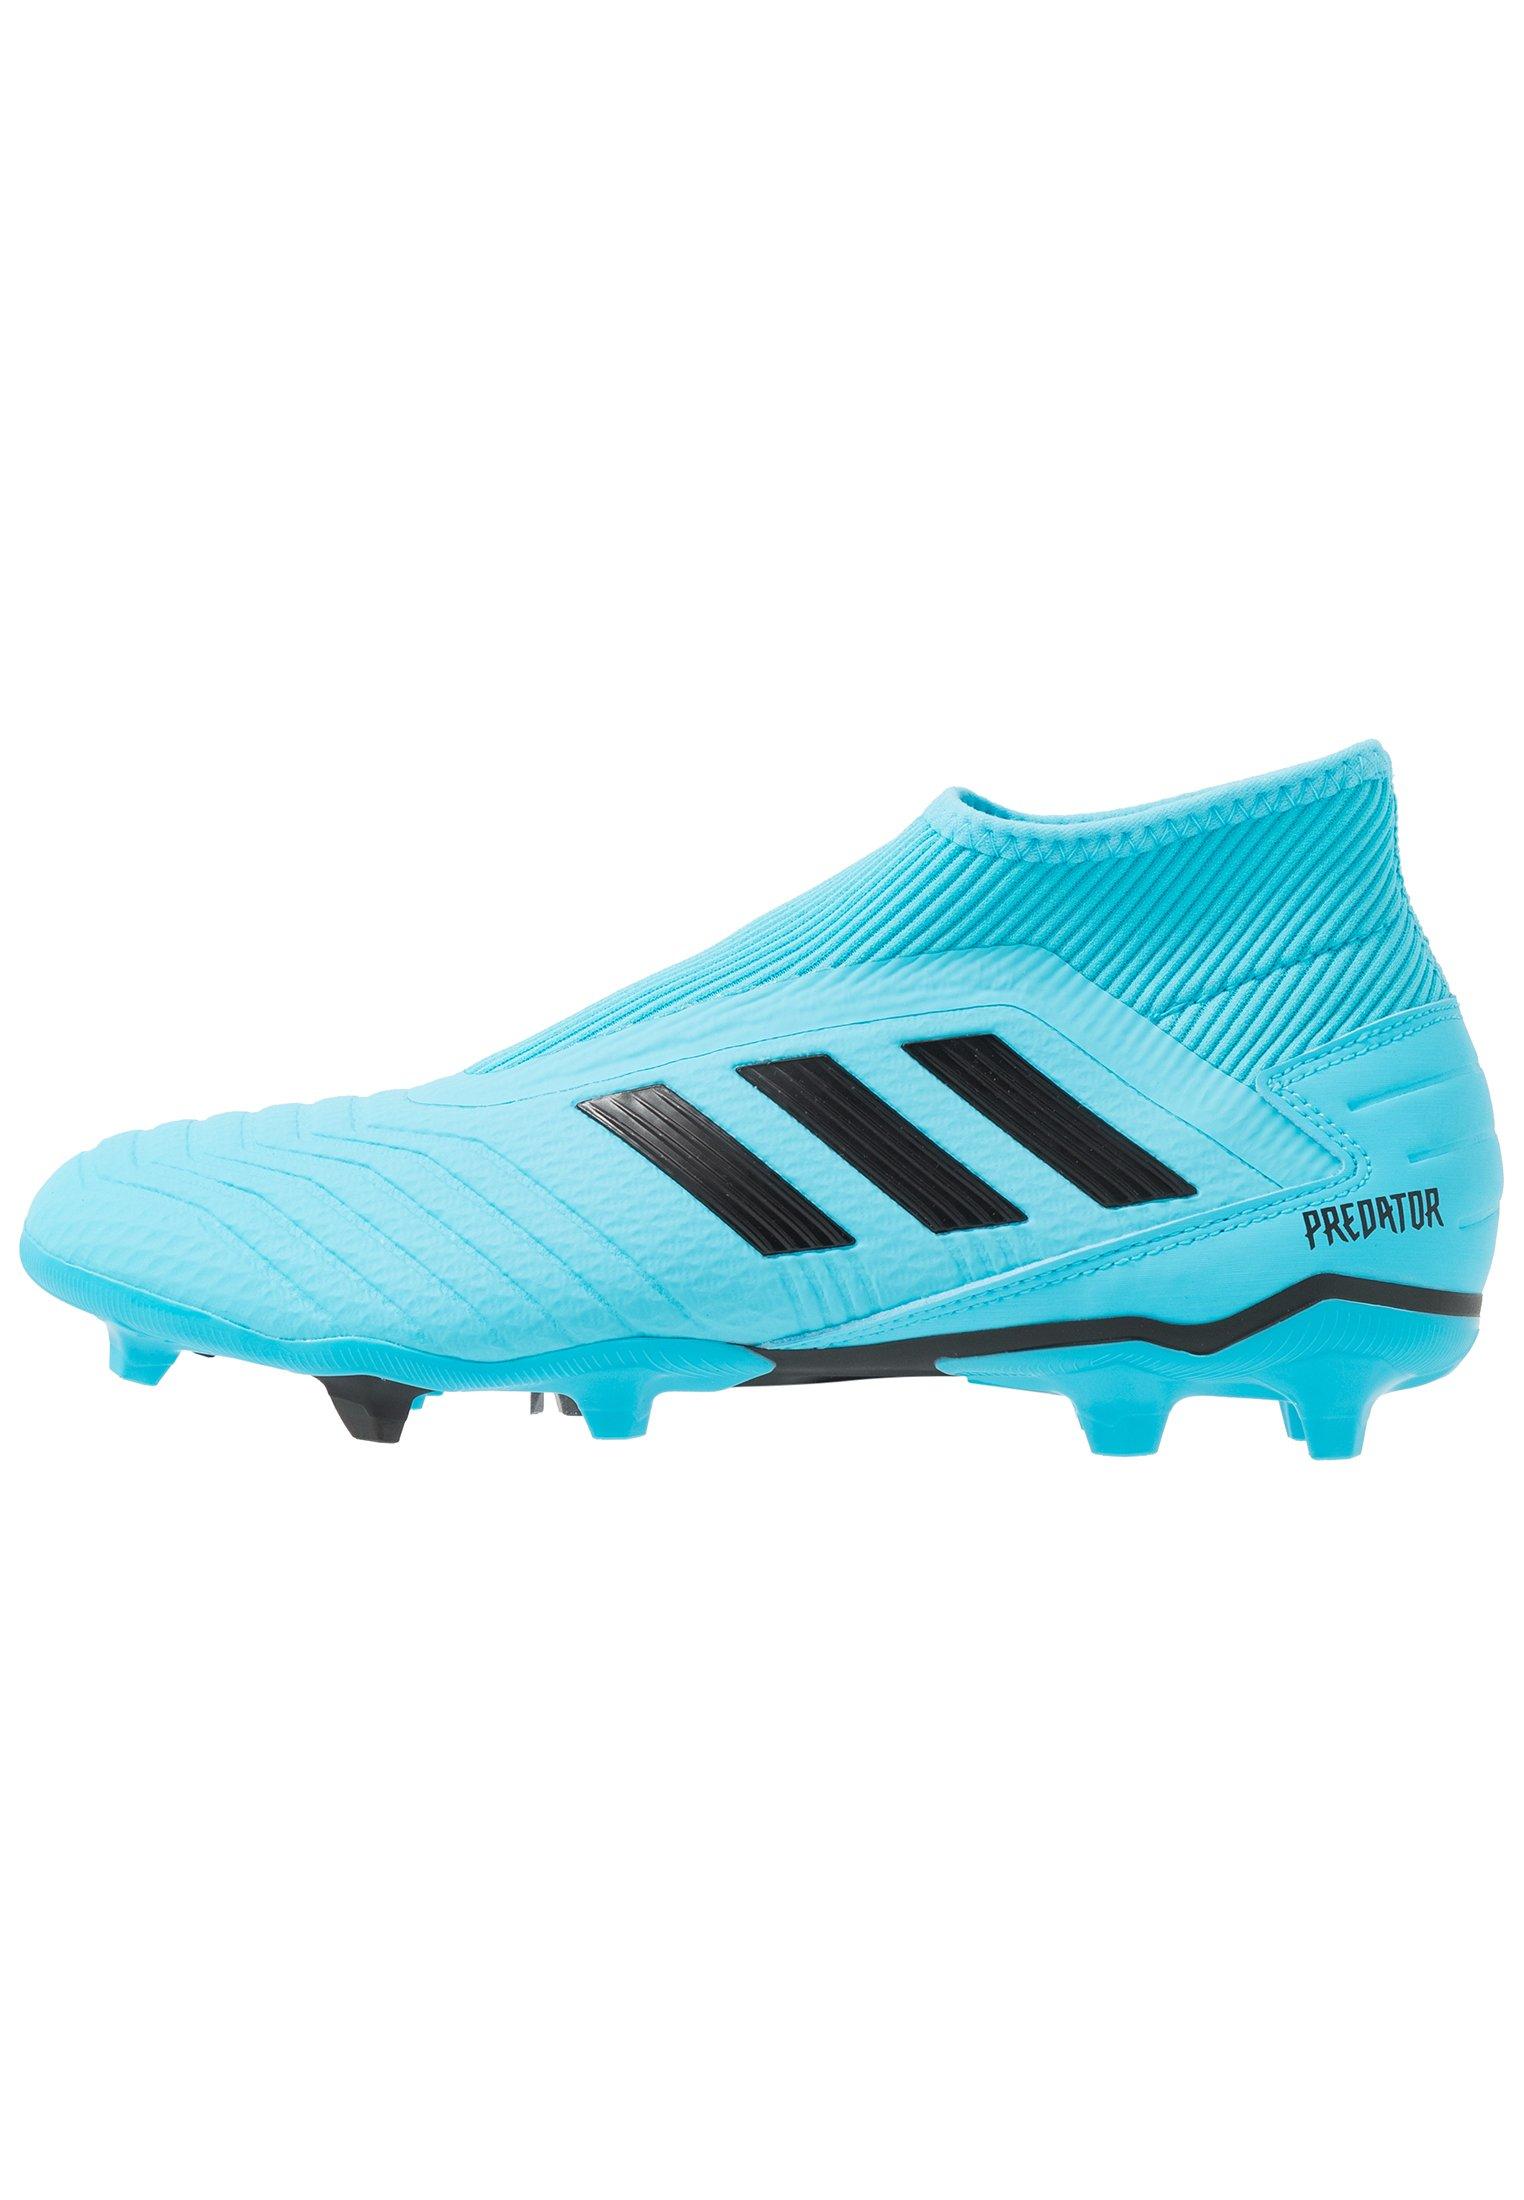 adidas Predator 19.3 LL FG Fußballschuhe |